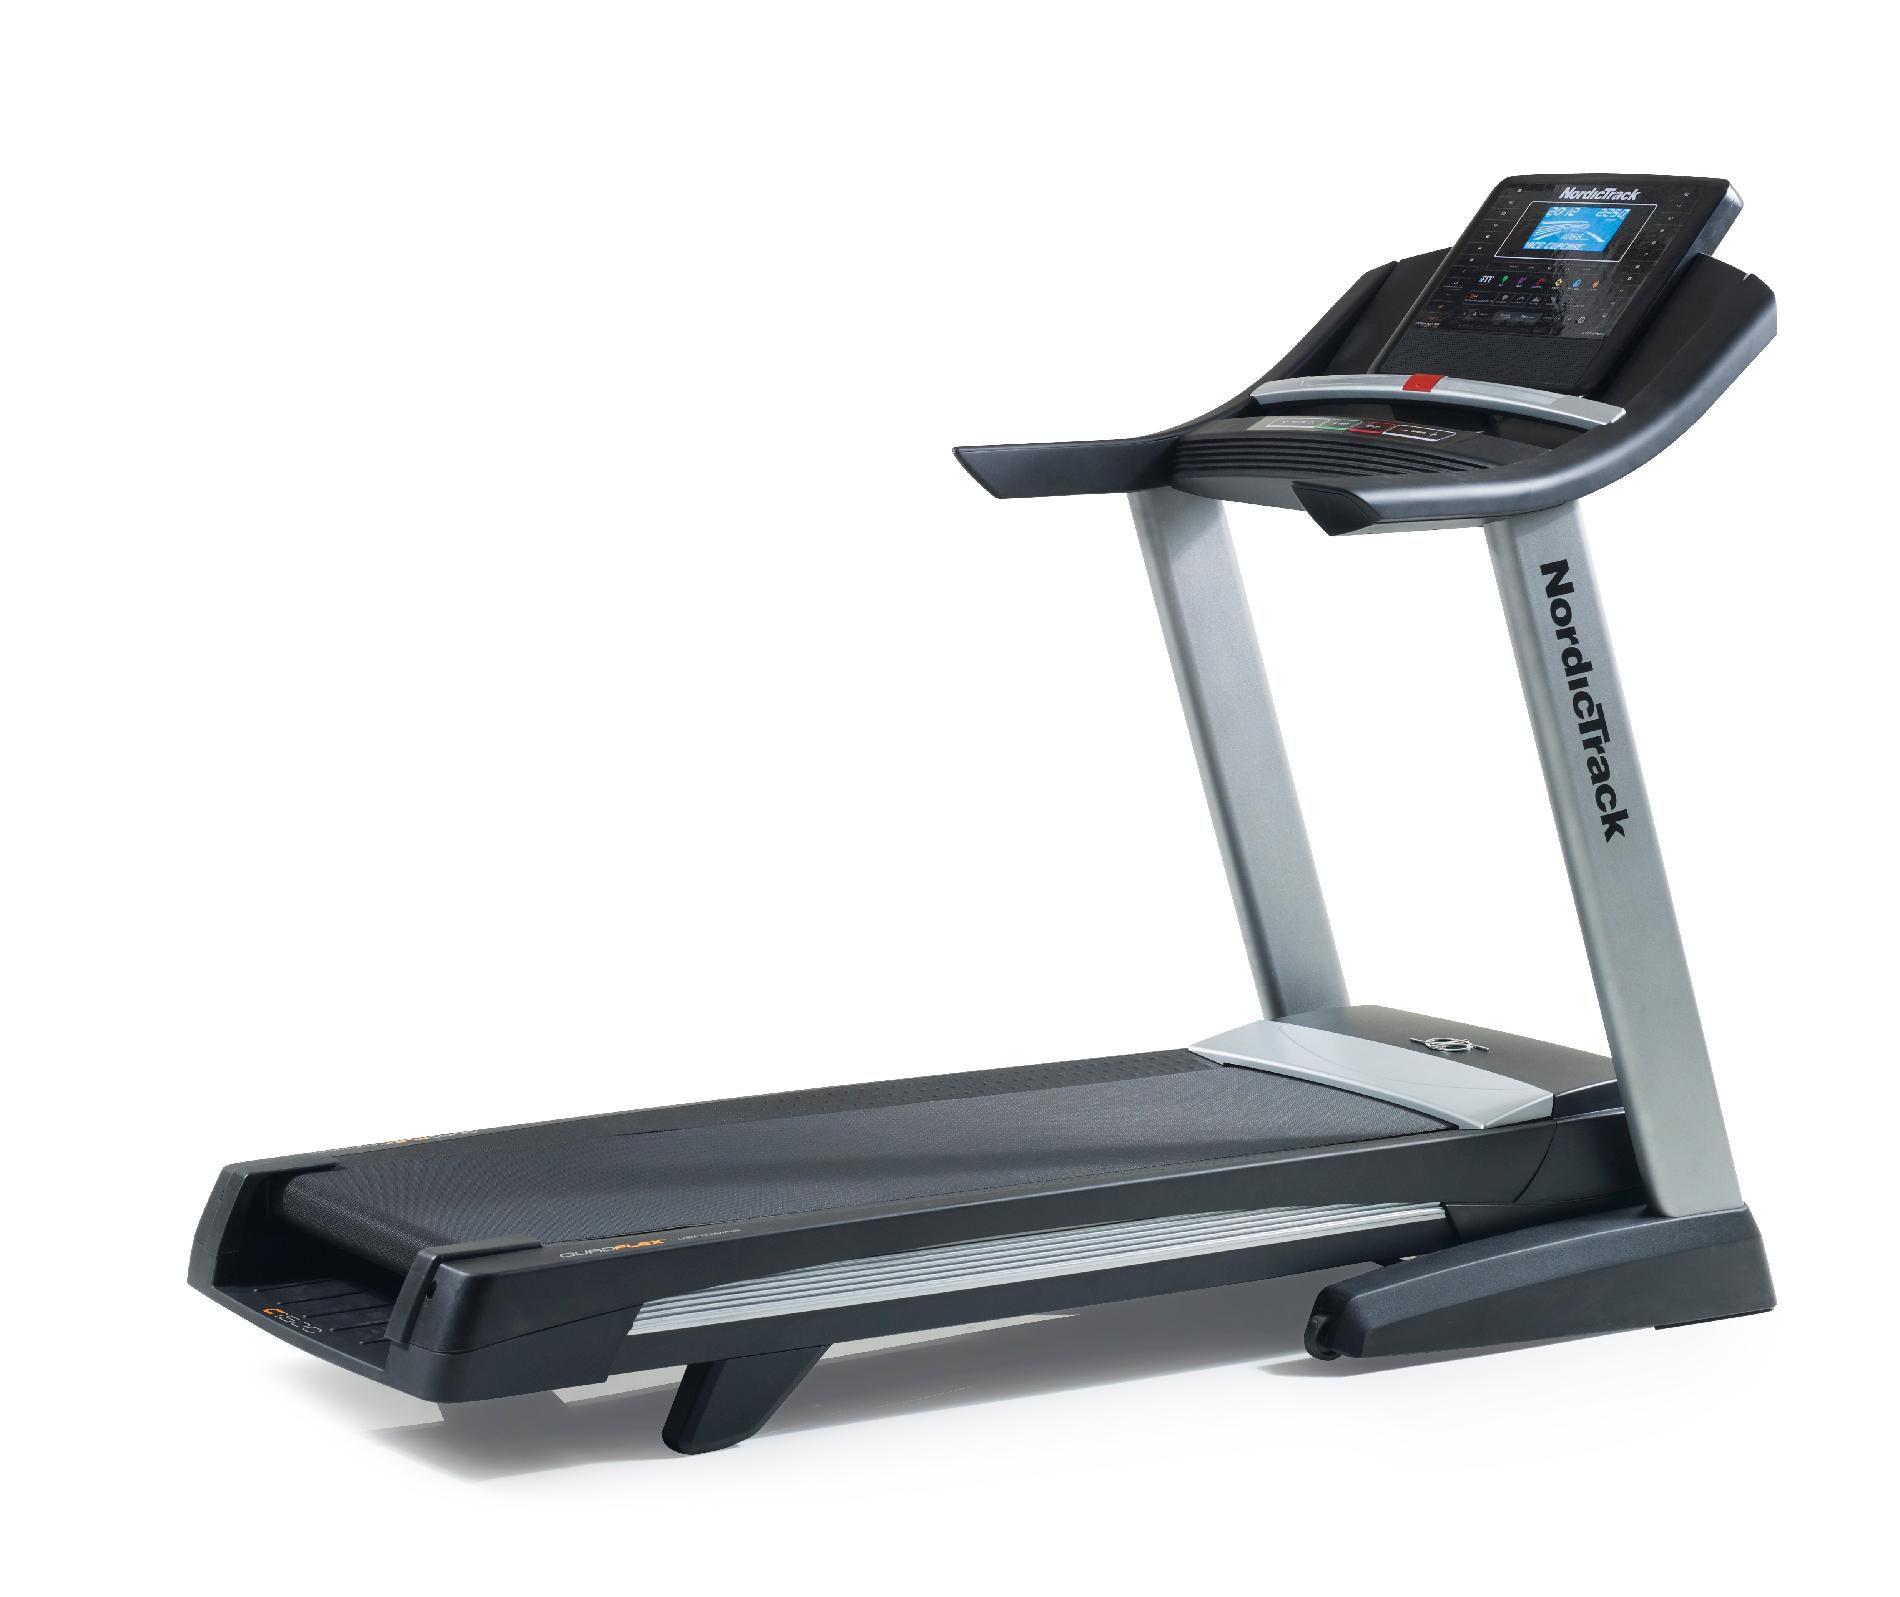 NordicTrack - C2255 - C2255 Treadmill